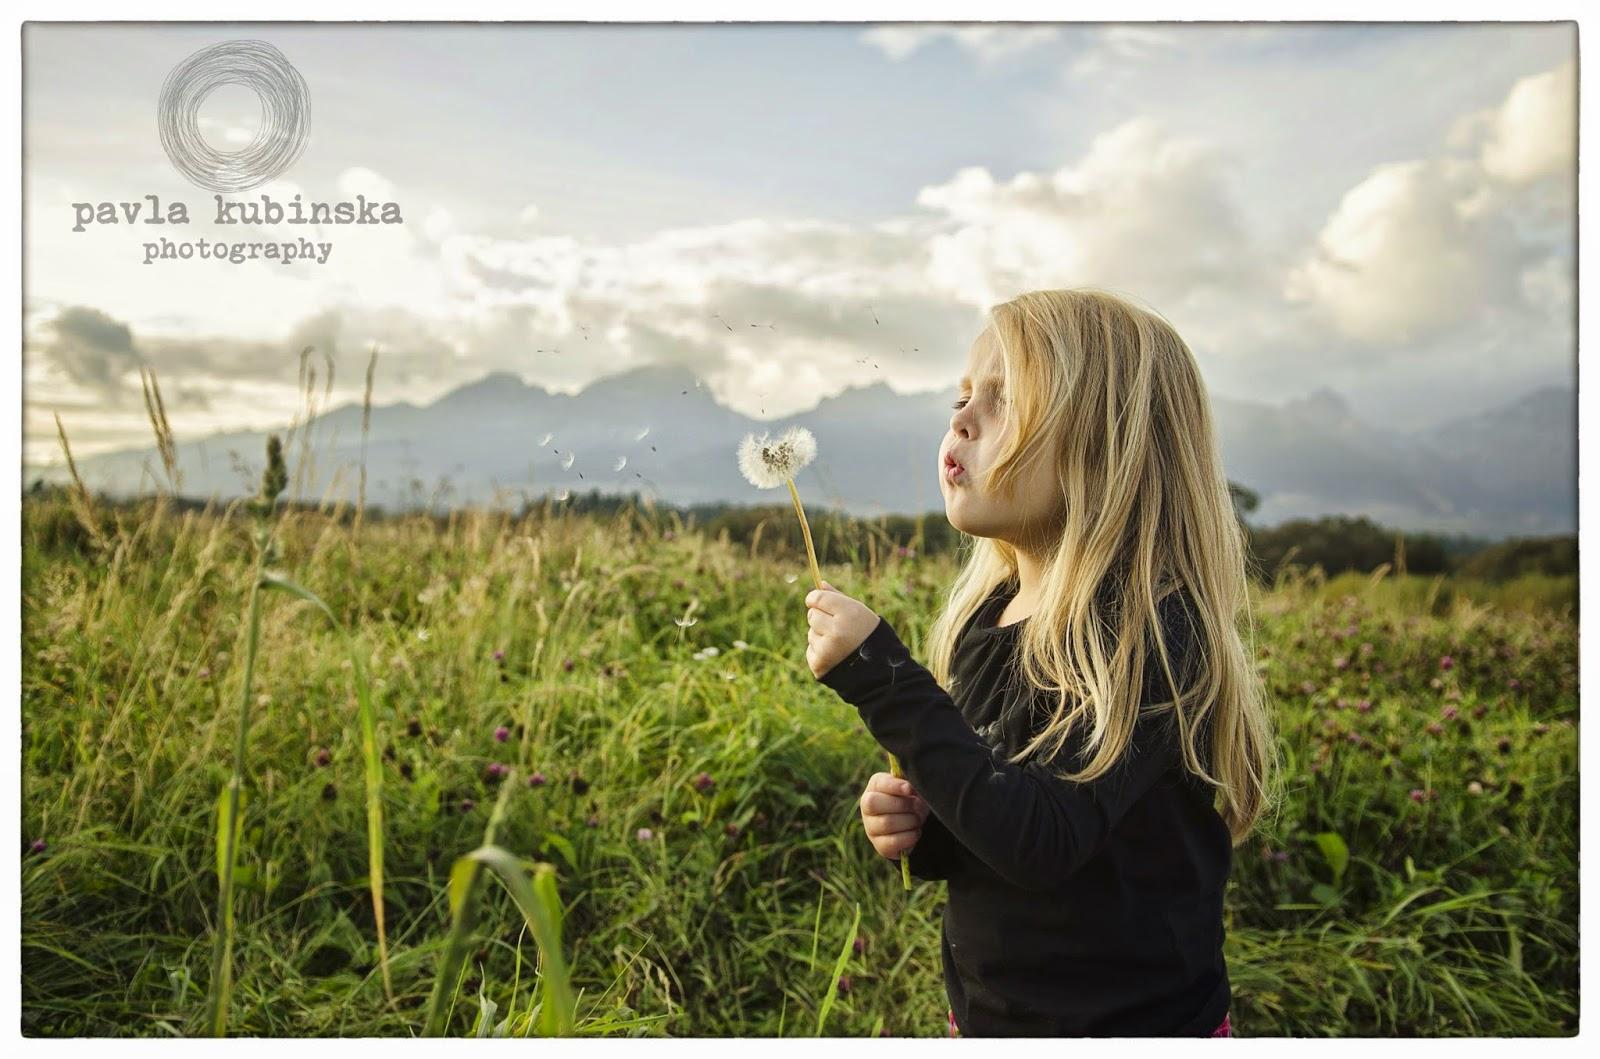 http://pavlakubinska.blogspot.sk/2014/10/lara-zara-ich-mama-zuzana.html